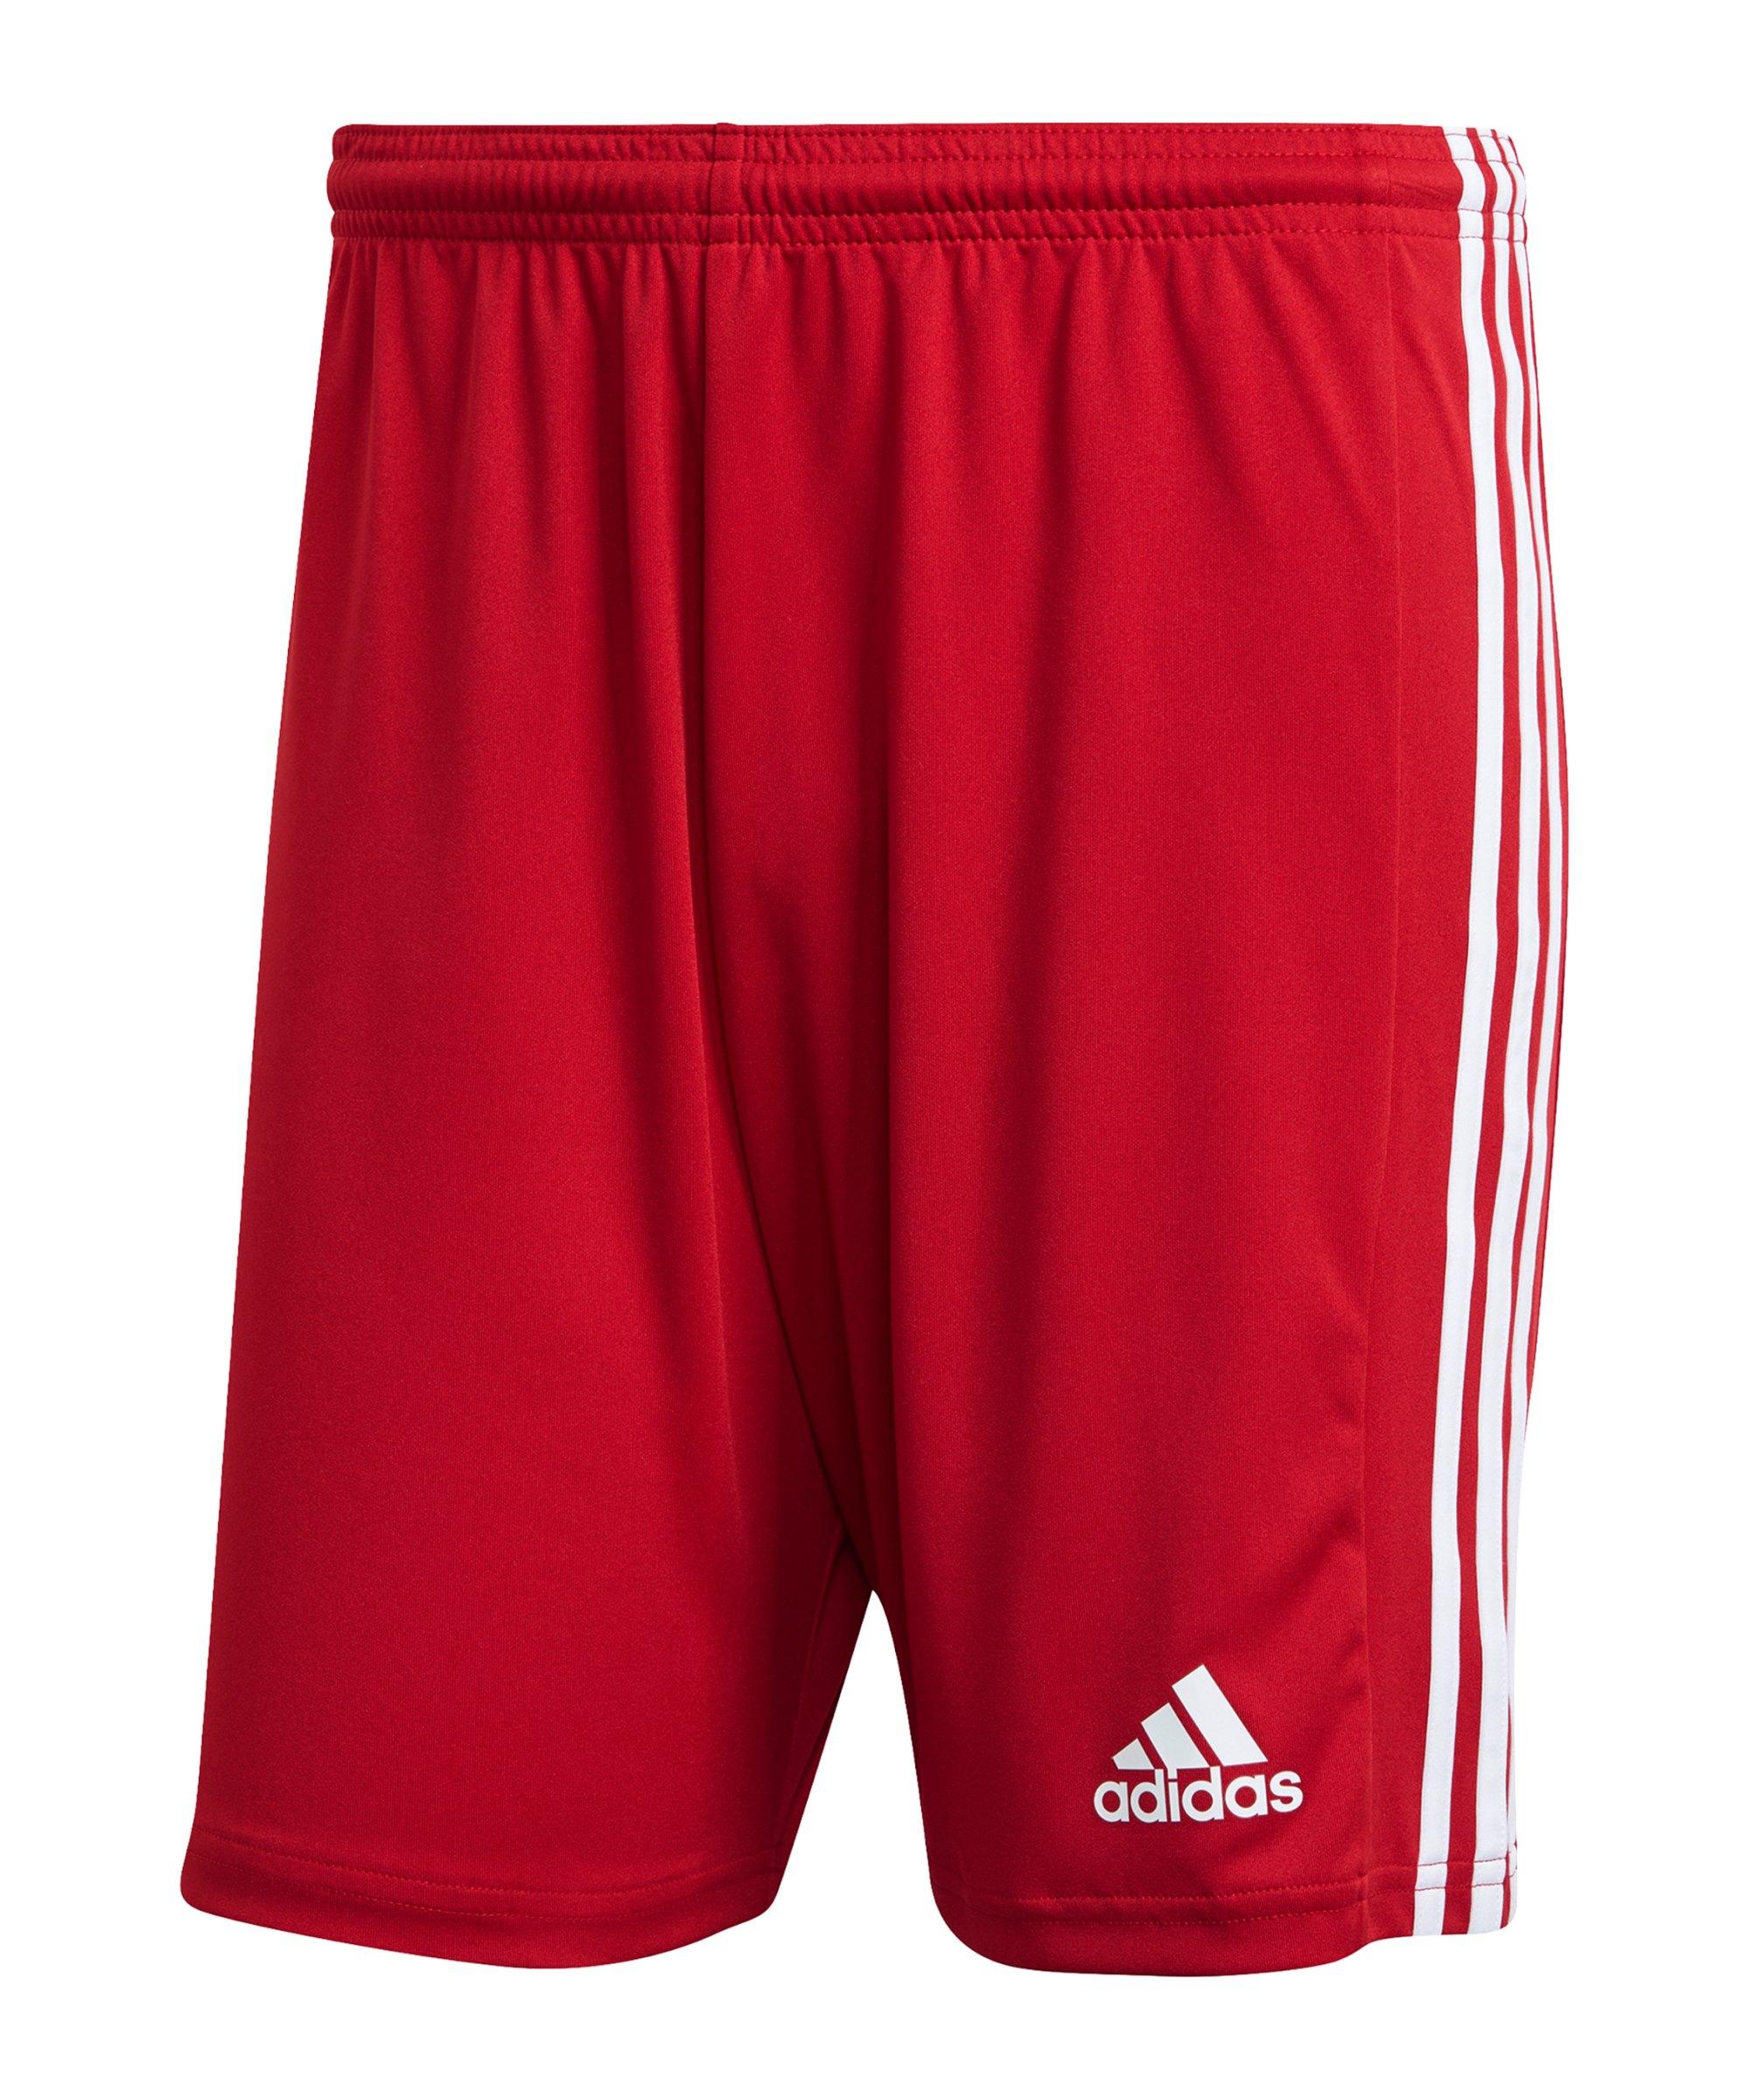 adidas Squadra 21 Short Rot Weiss - rot